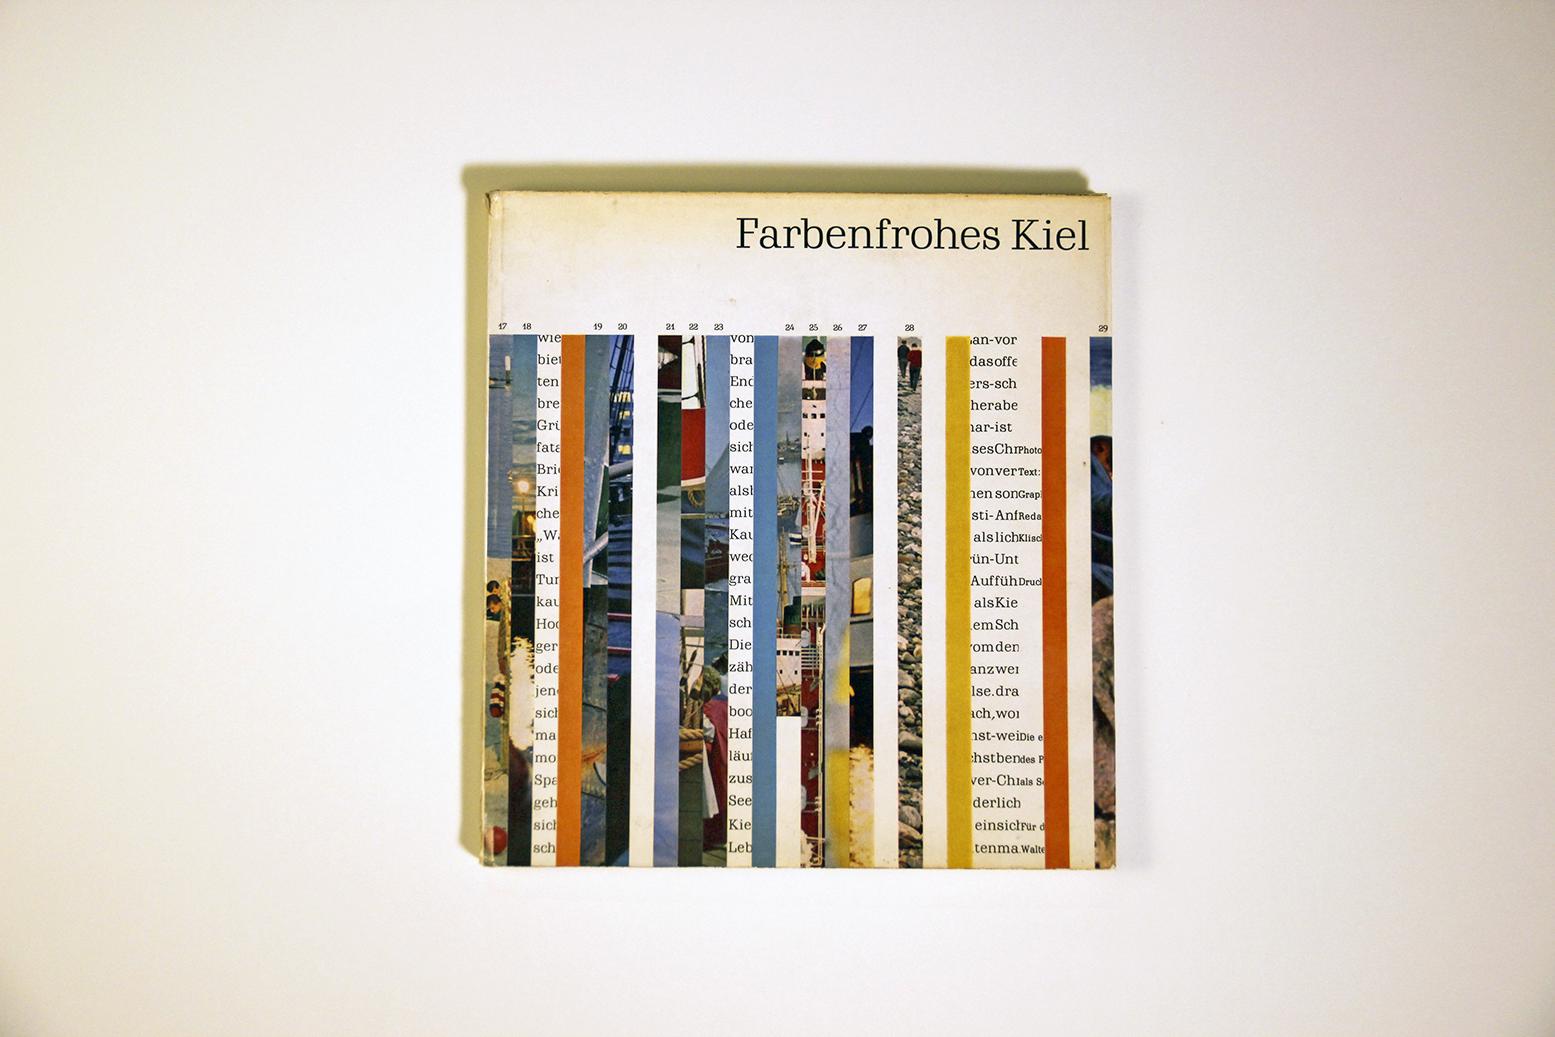 Farbenfrohes Kiel1.png